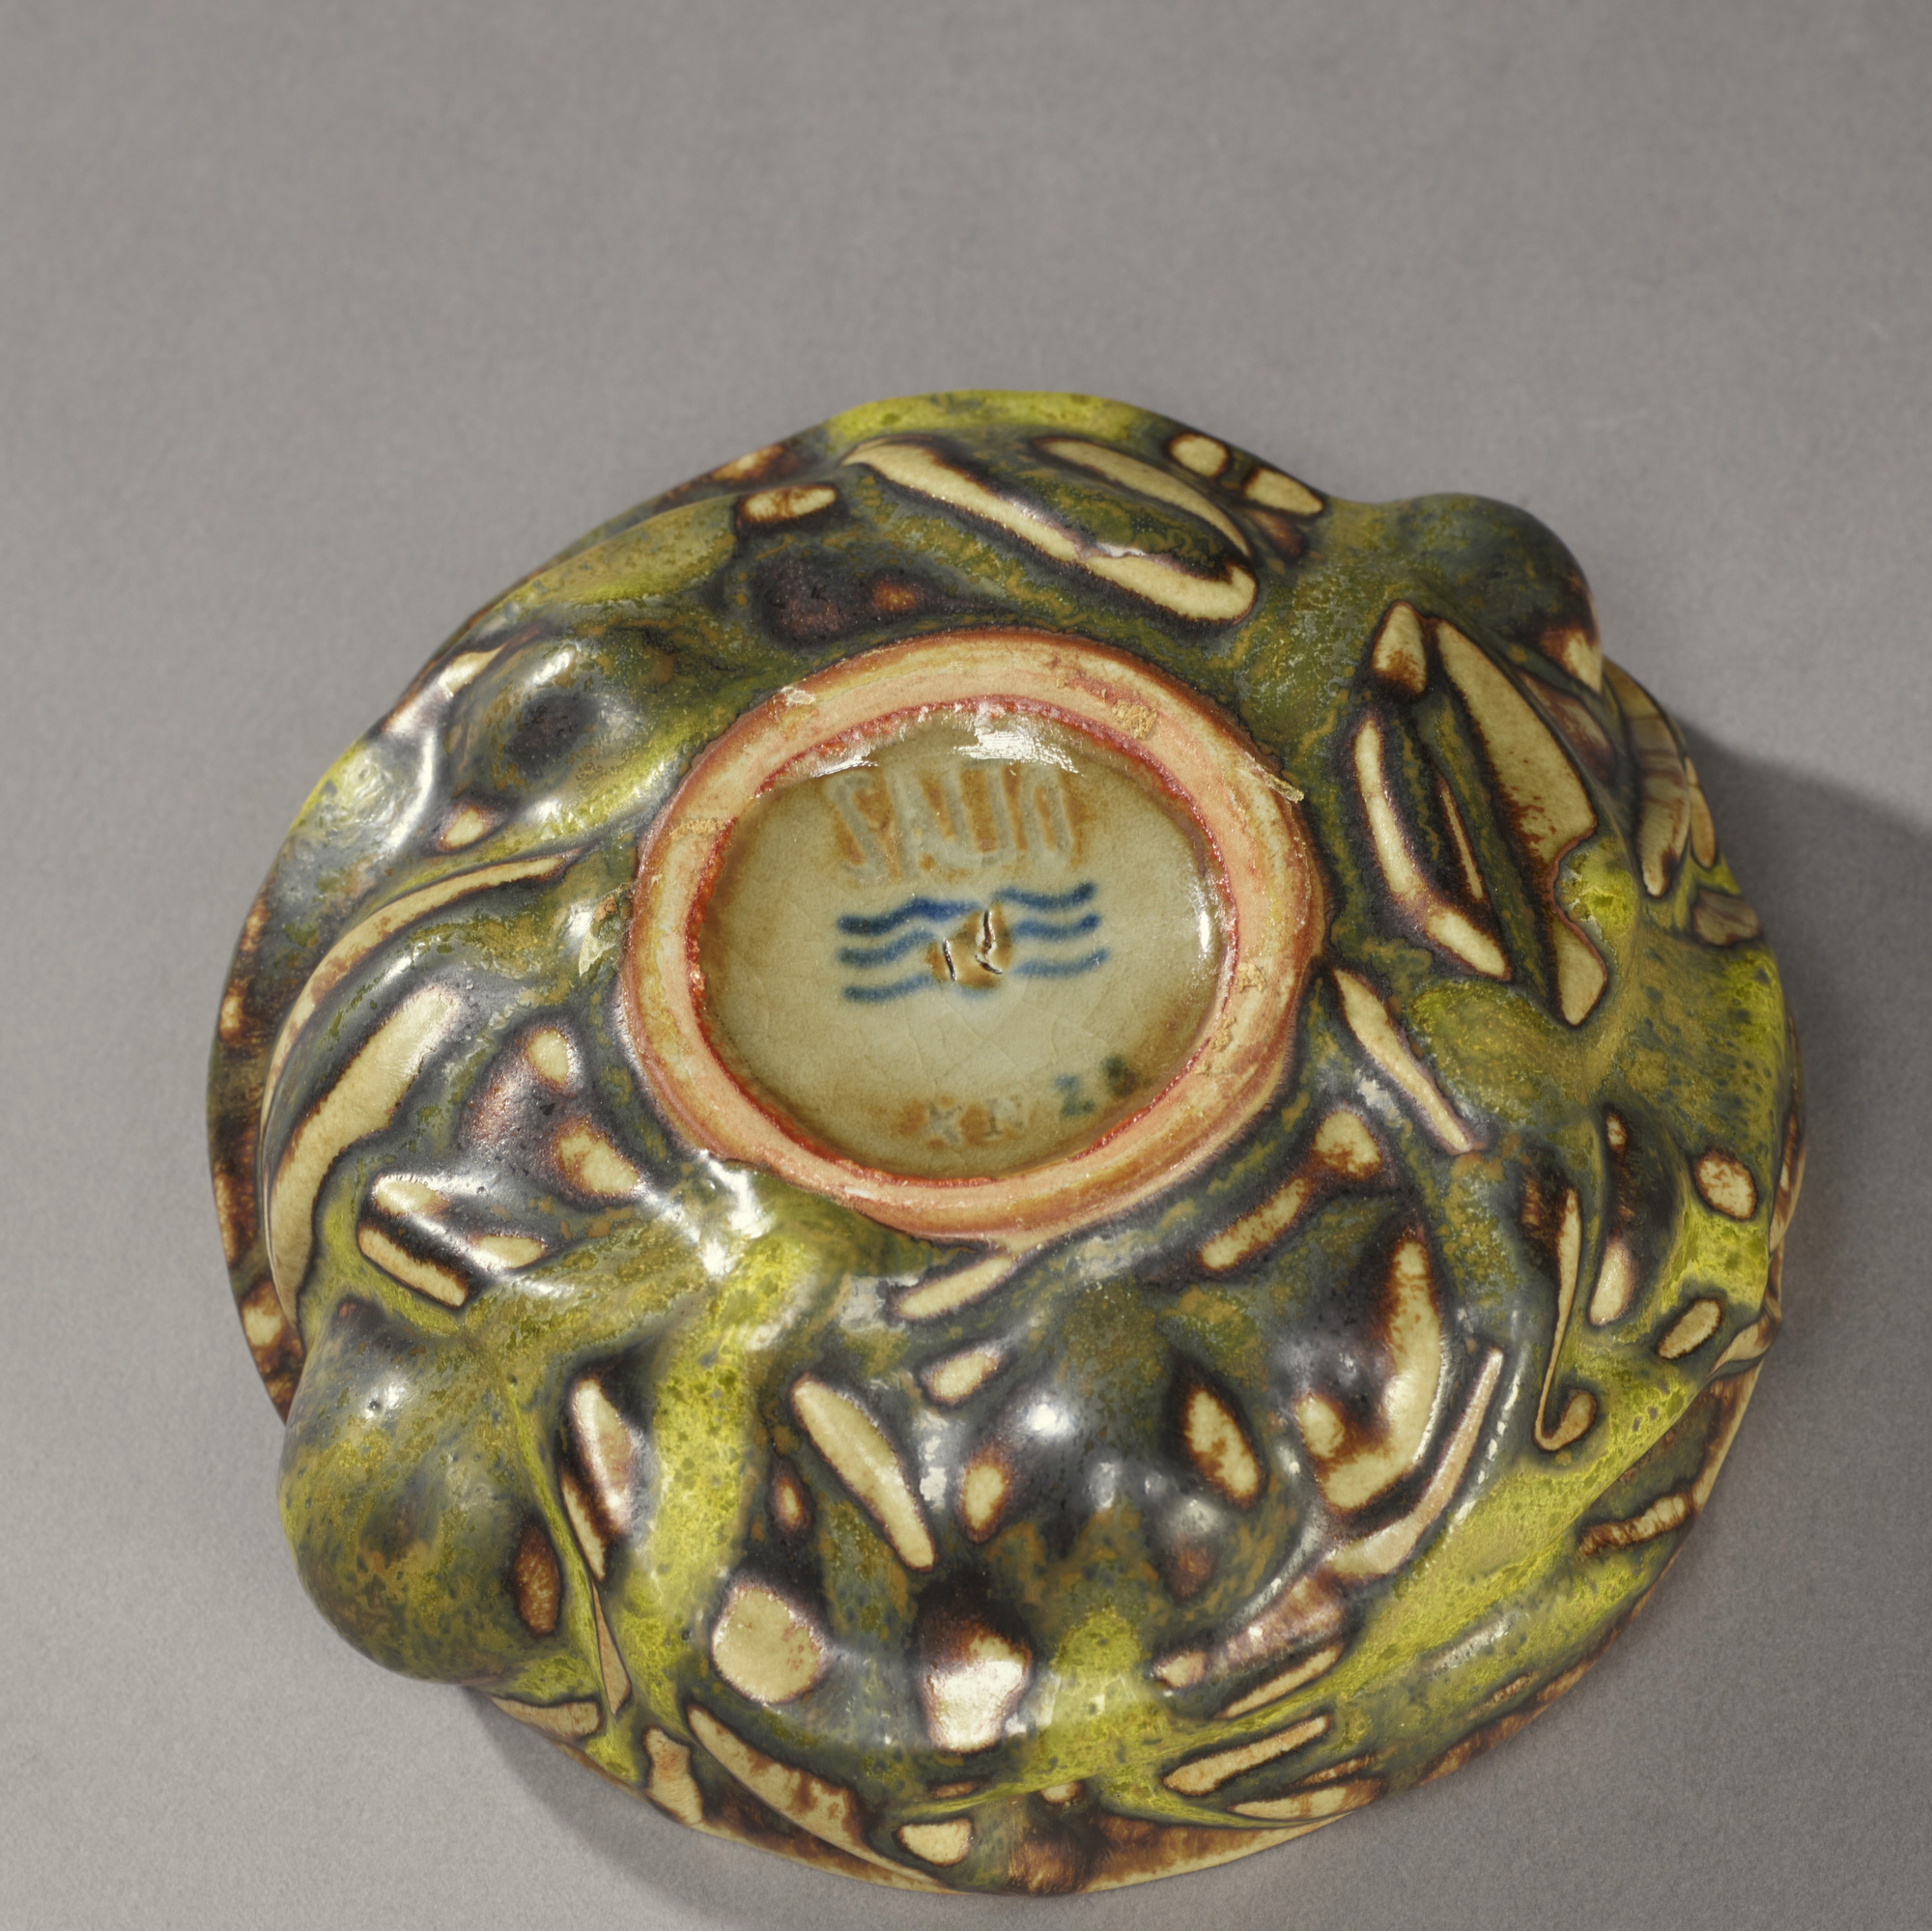 147: Axel Salto / Vine bowl (2 of 2)